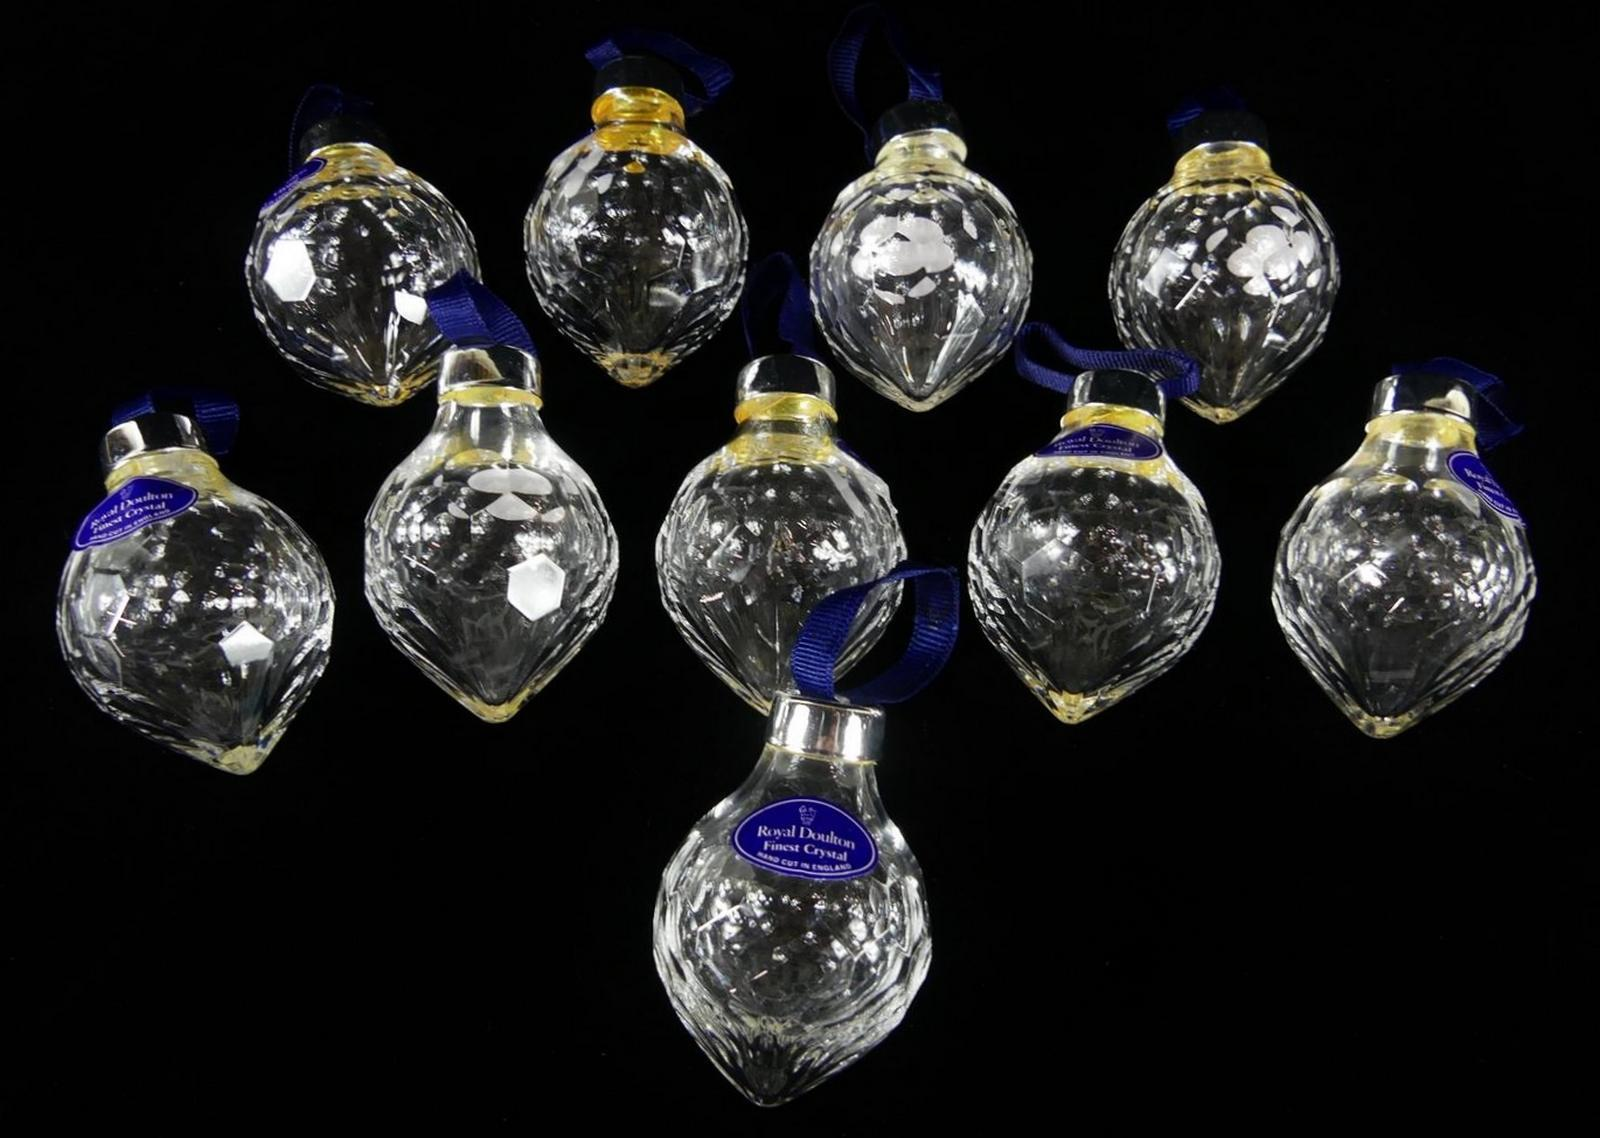 ROYAL DOULTON CHRISTMAS TREE ORNAMENTS